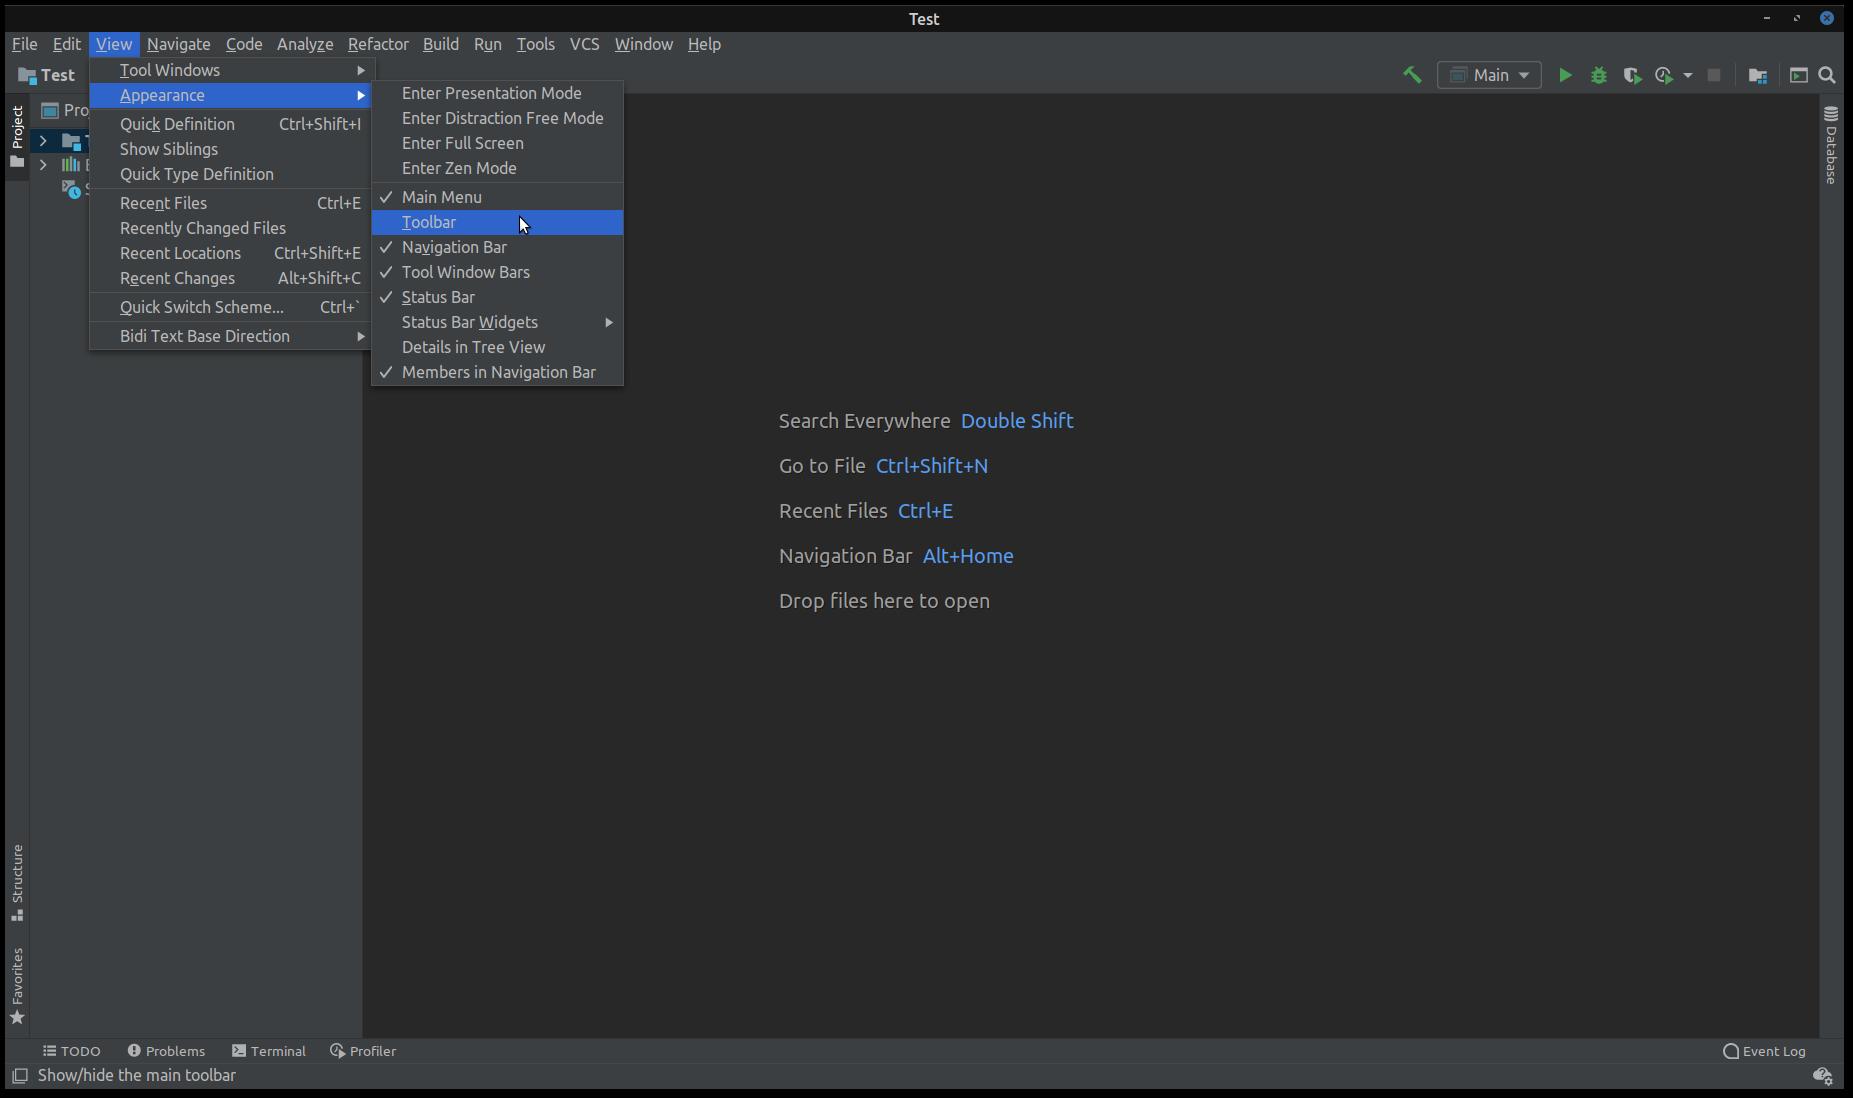 IntelliJ IDEA Enable Toolbar